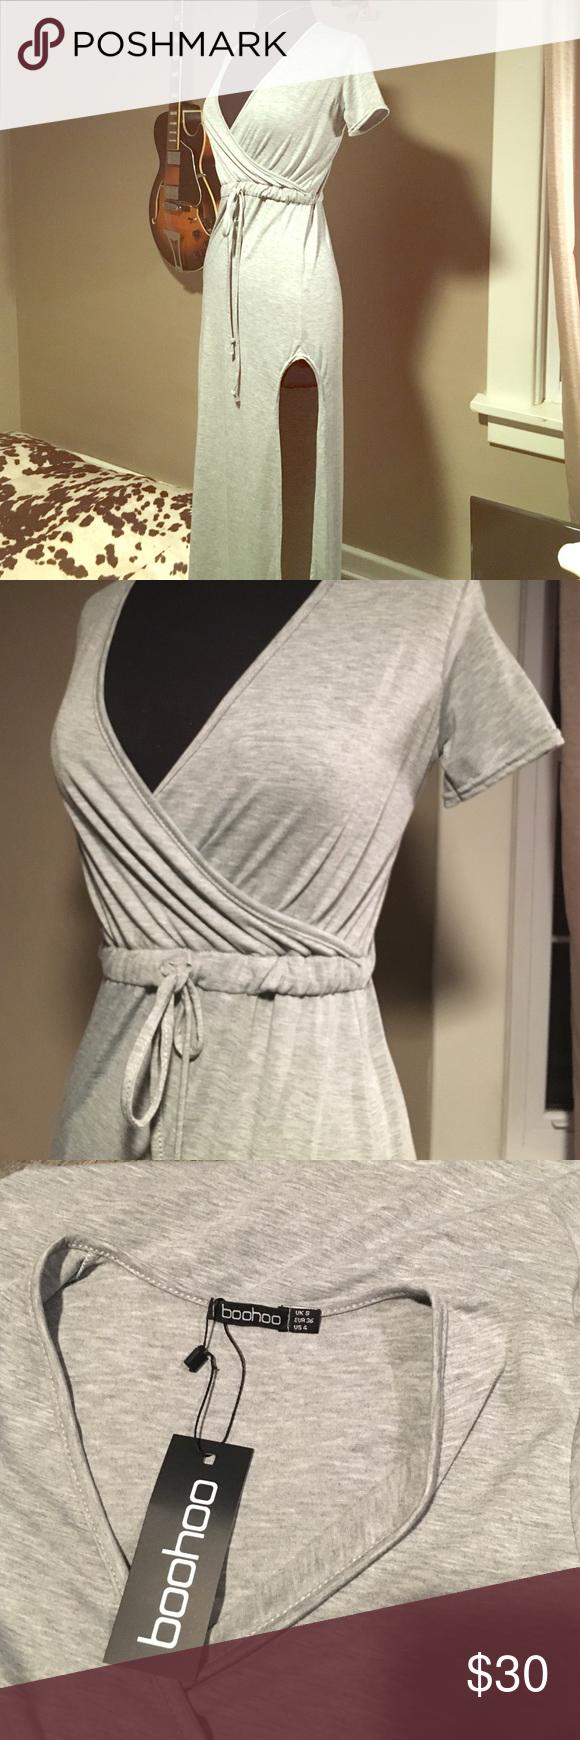 Boohoo maxi dress Grey boohoo maxi dress with high slit. New with tags. Size small Boohoo Dresses Maxi